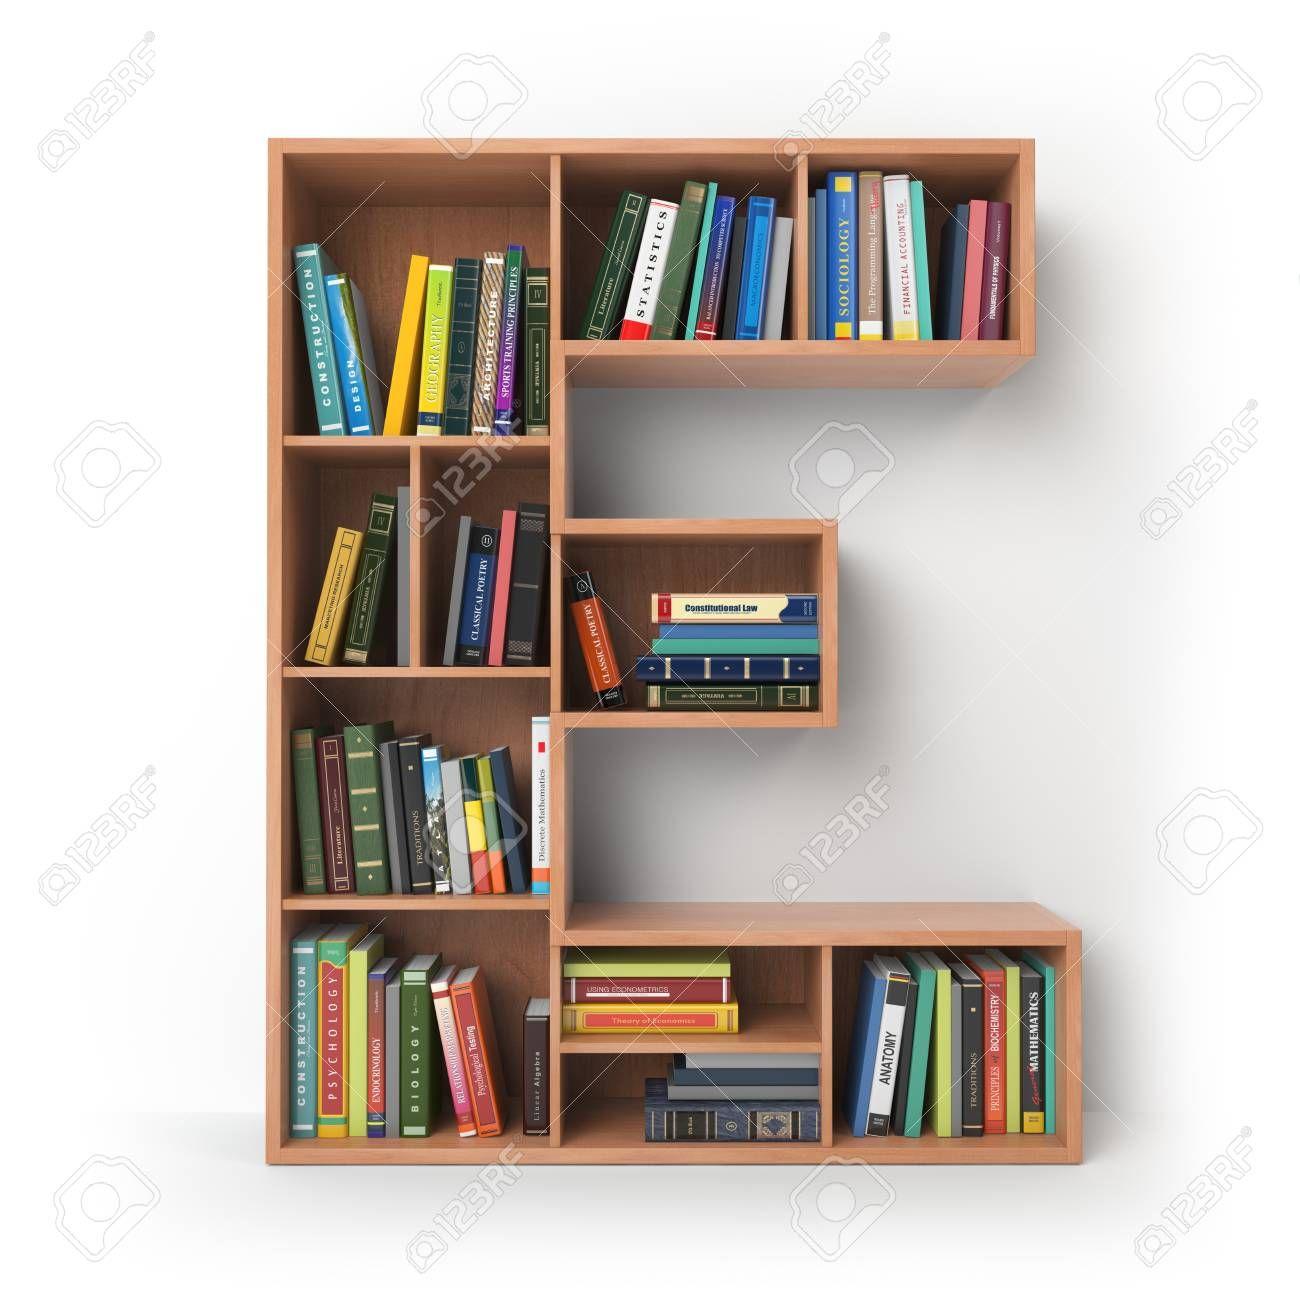 Letter E Alphabet In The Form Of Shelves With Books Isolated On Whit Decoracao De Casa Colorida Ideias De Decoracao Para Casa Design De Interiores Para Quarto